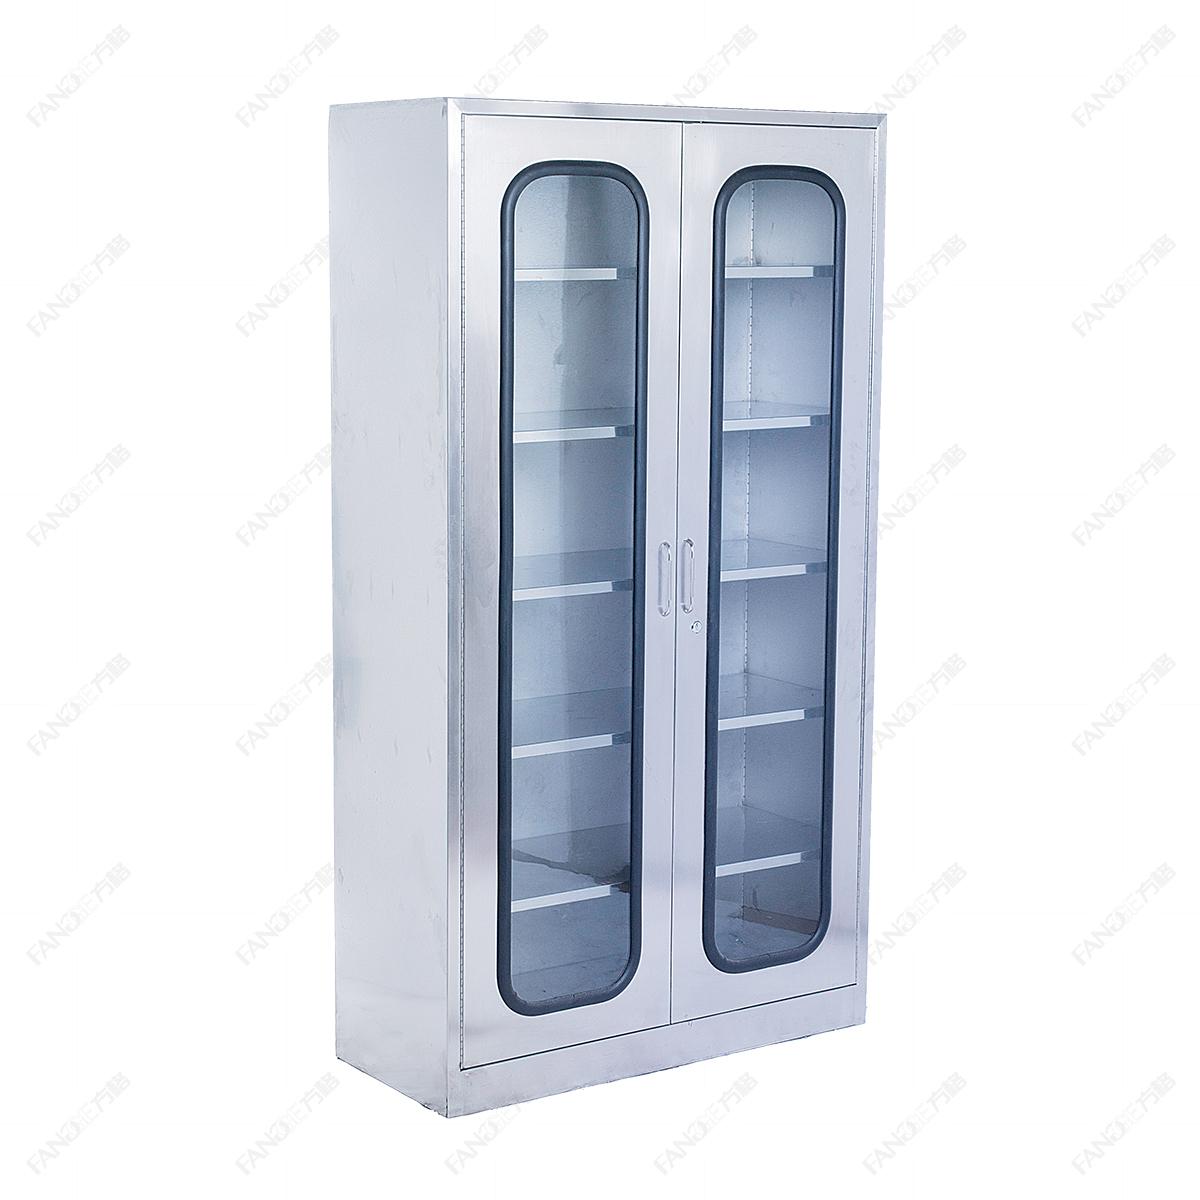 D01不锈钢器械柜